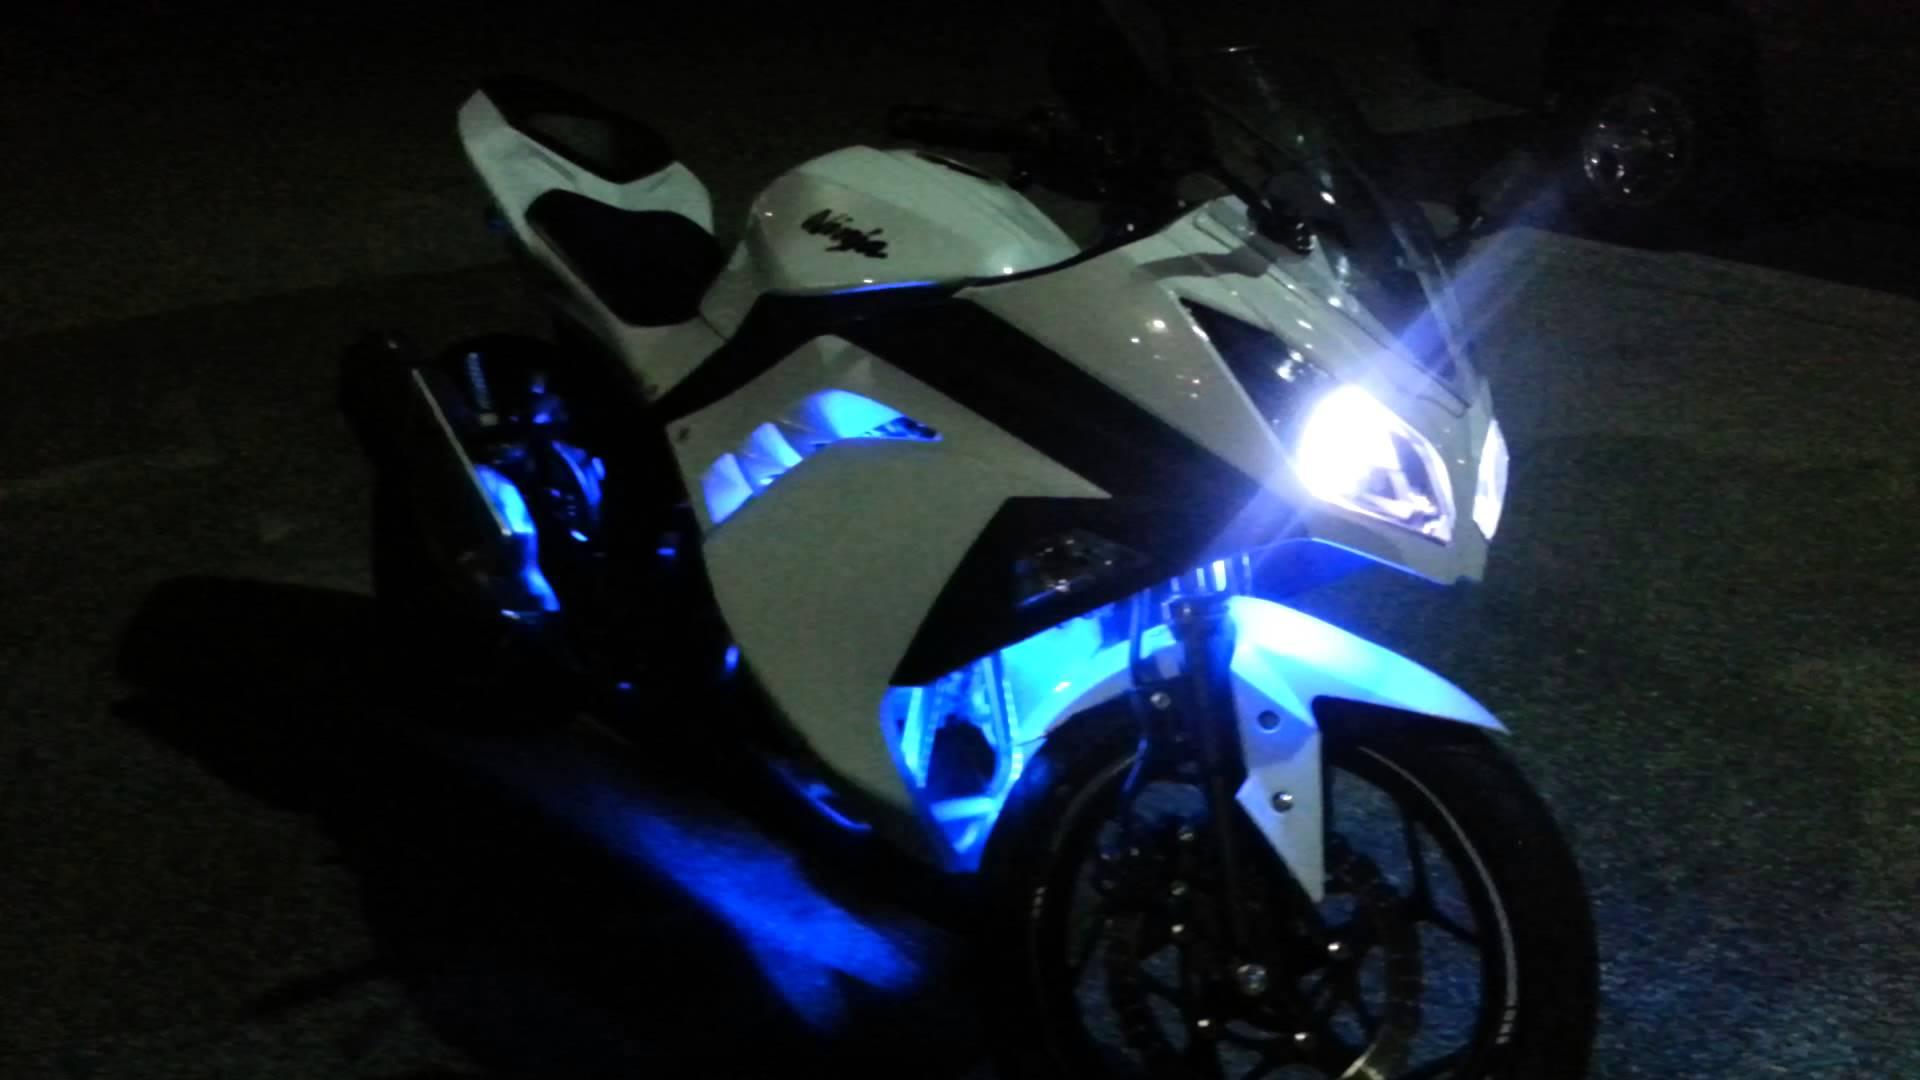 Ledglow 2013 Kawasaki Ninja 300